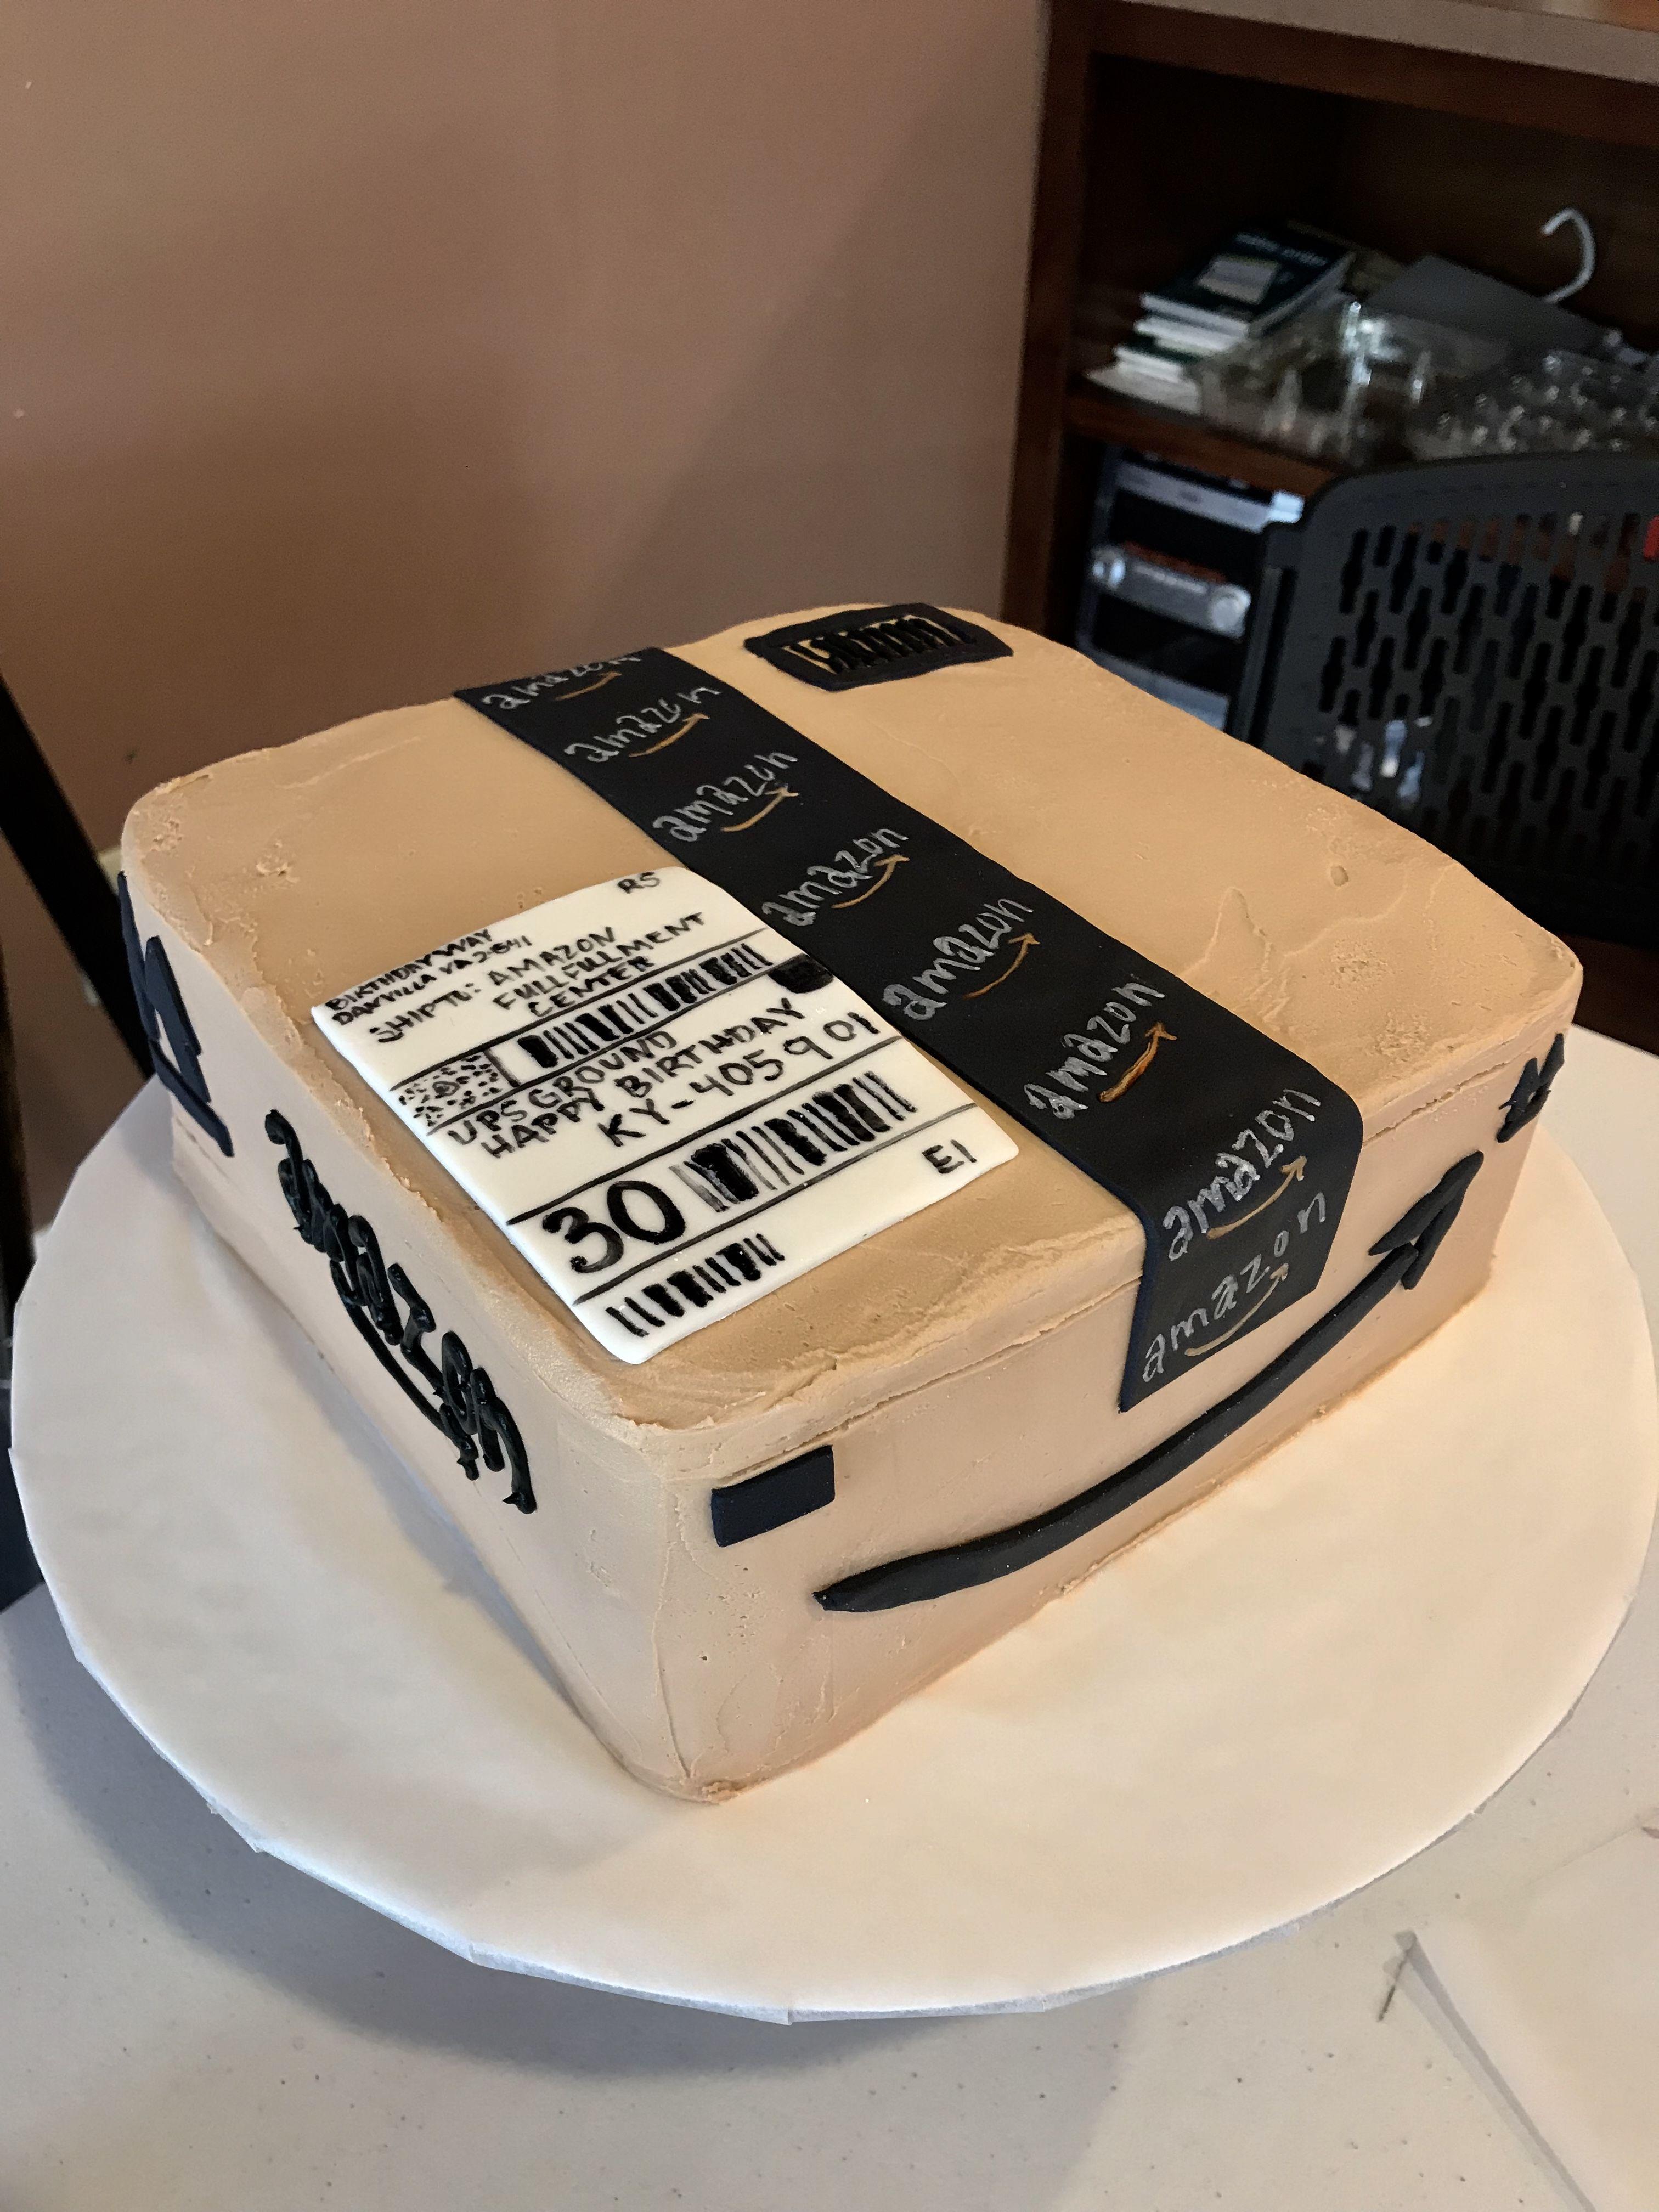 Amazon box cake sweet dreams bakery box cake amazon box